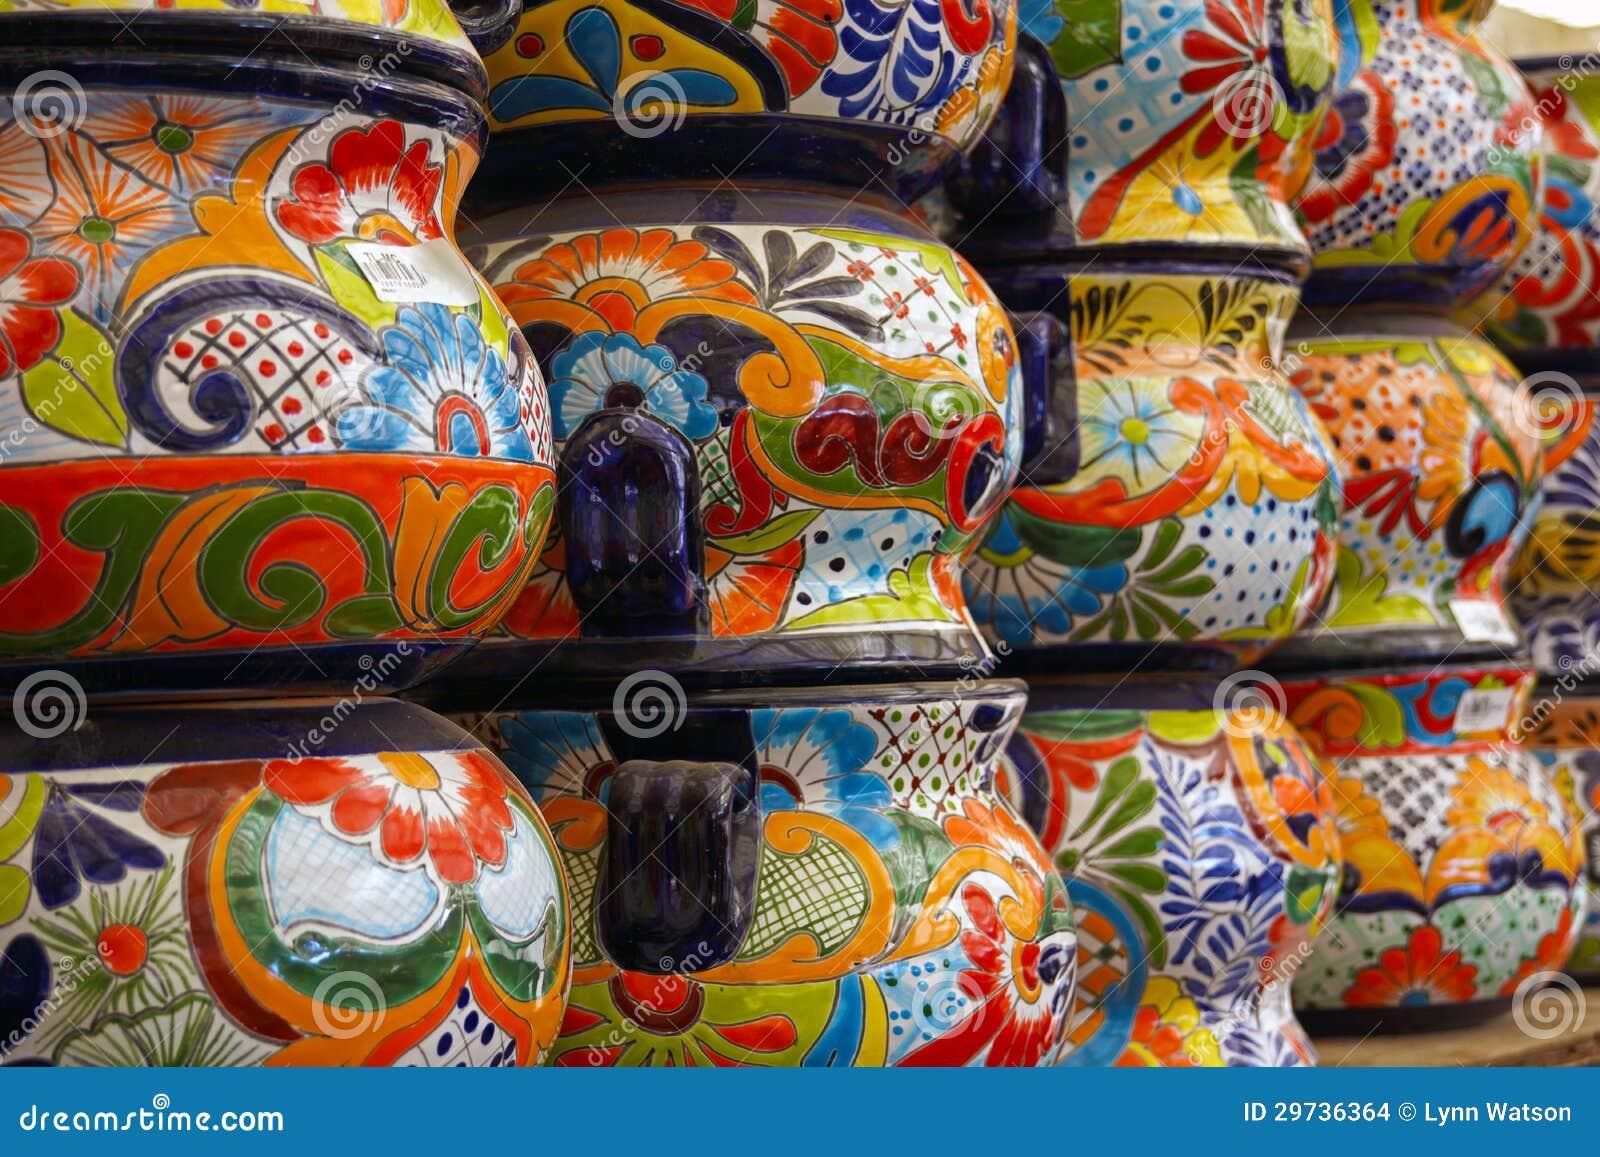 Colorful Mexican Talavera Pots